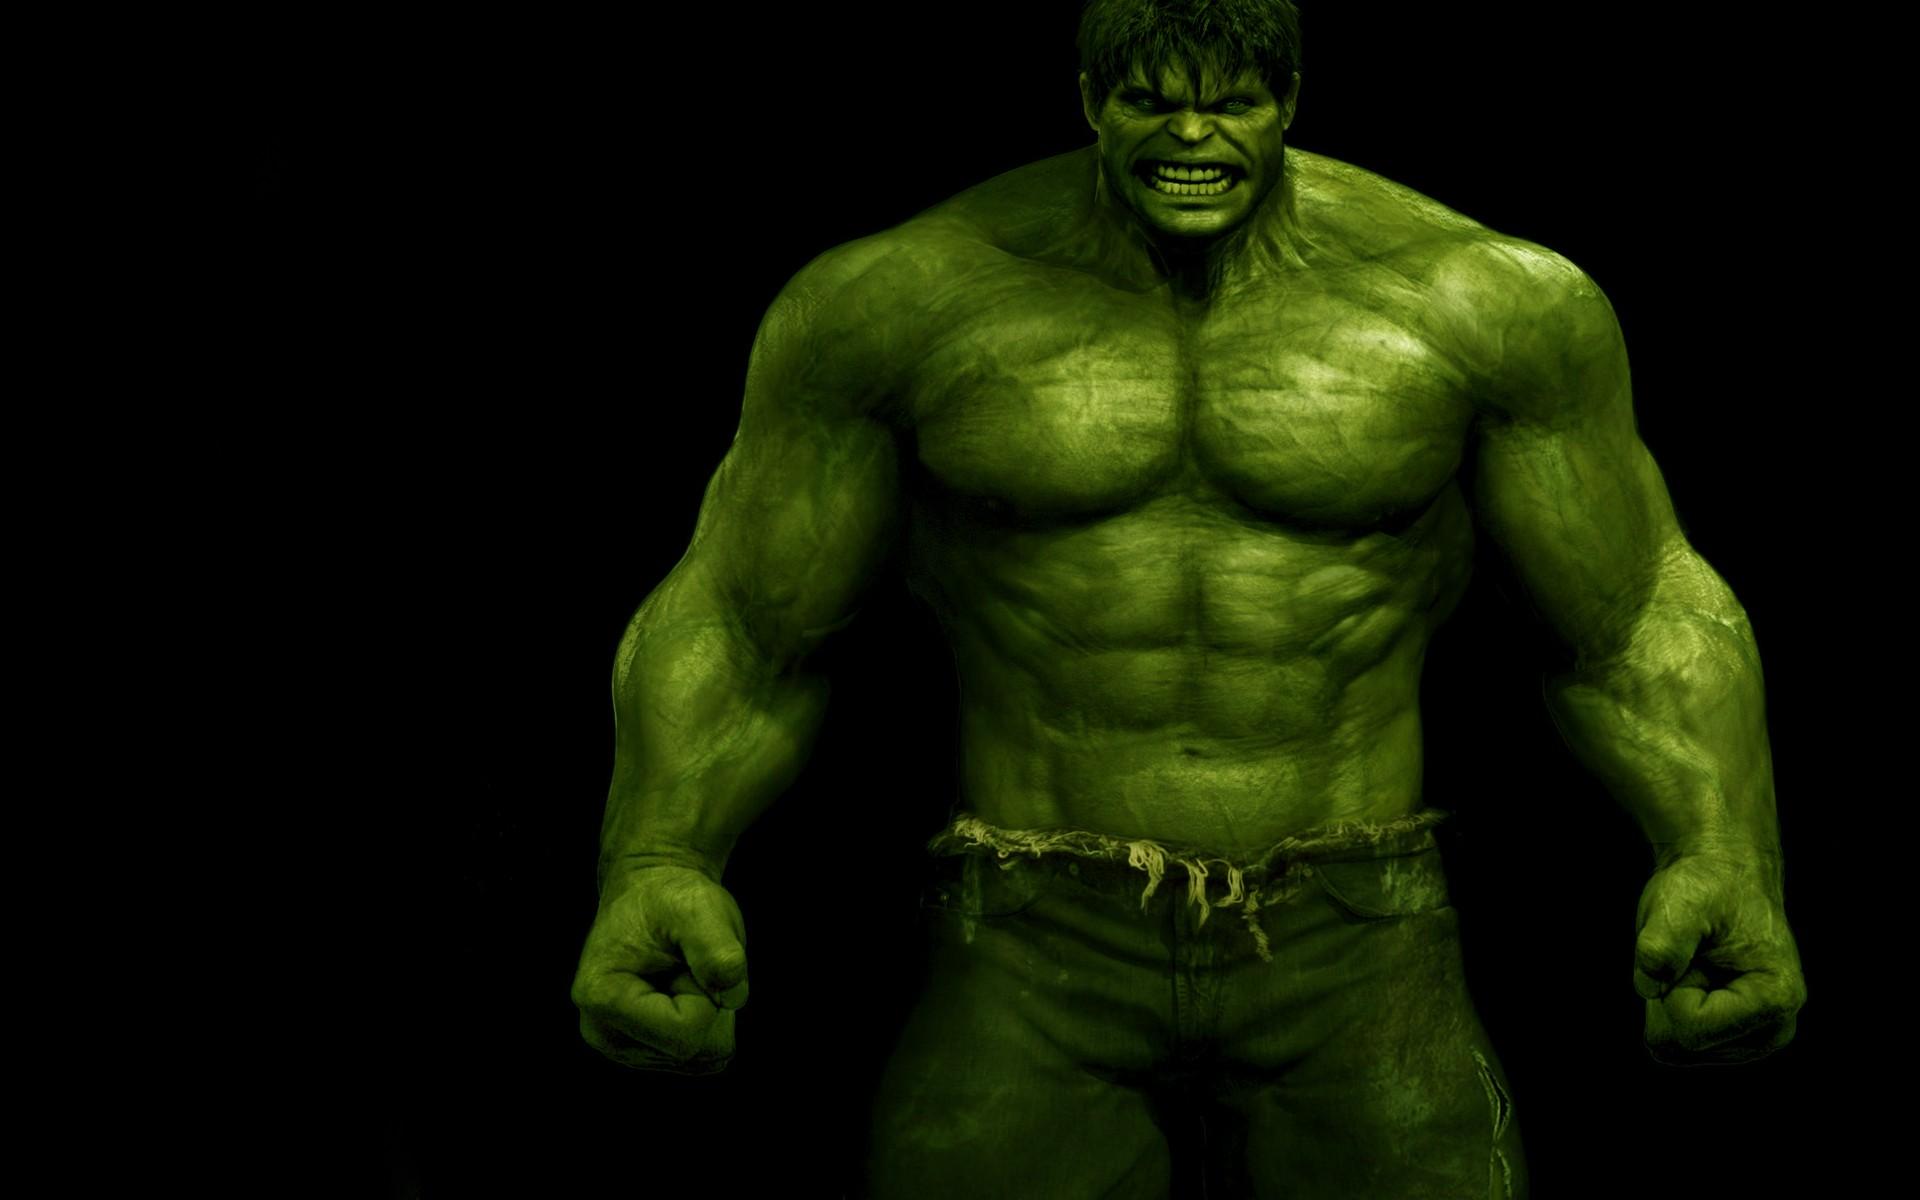 Incredible Hulk Wallpapers 4K 1920x1200 px   4USkY 1920x1200